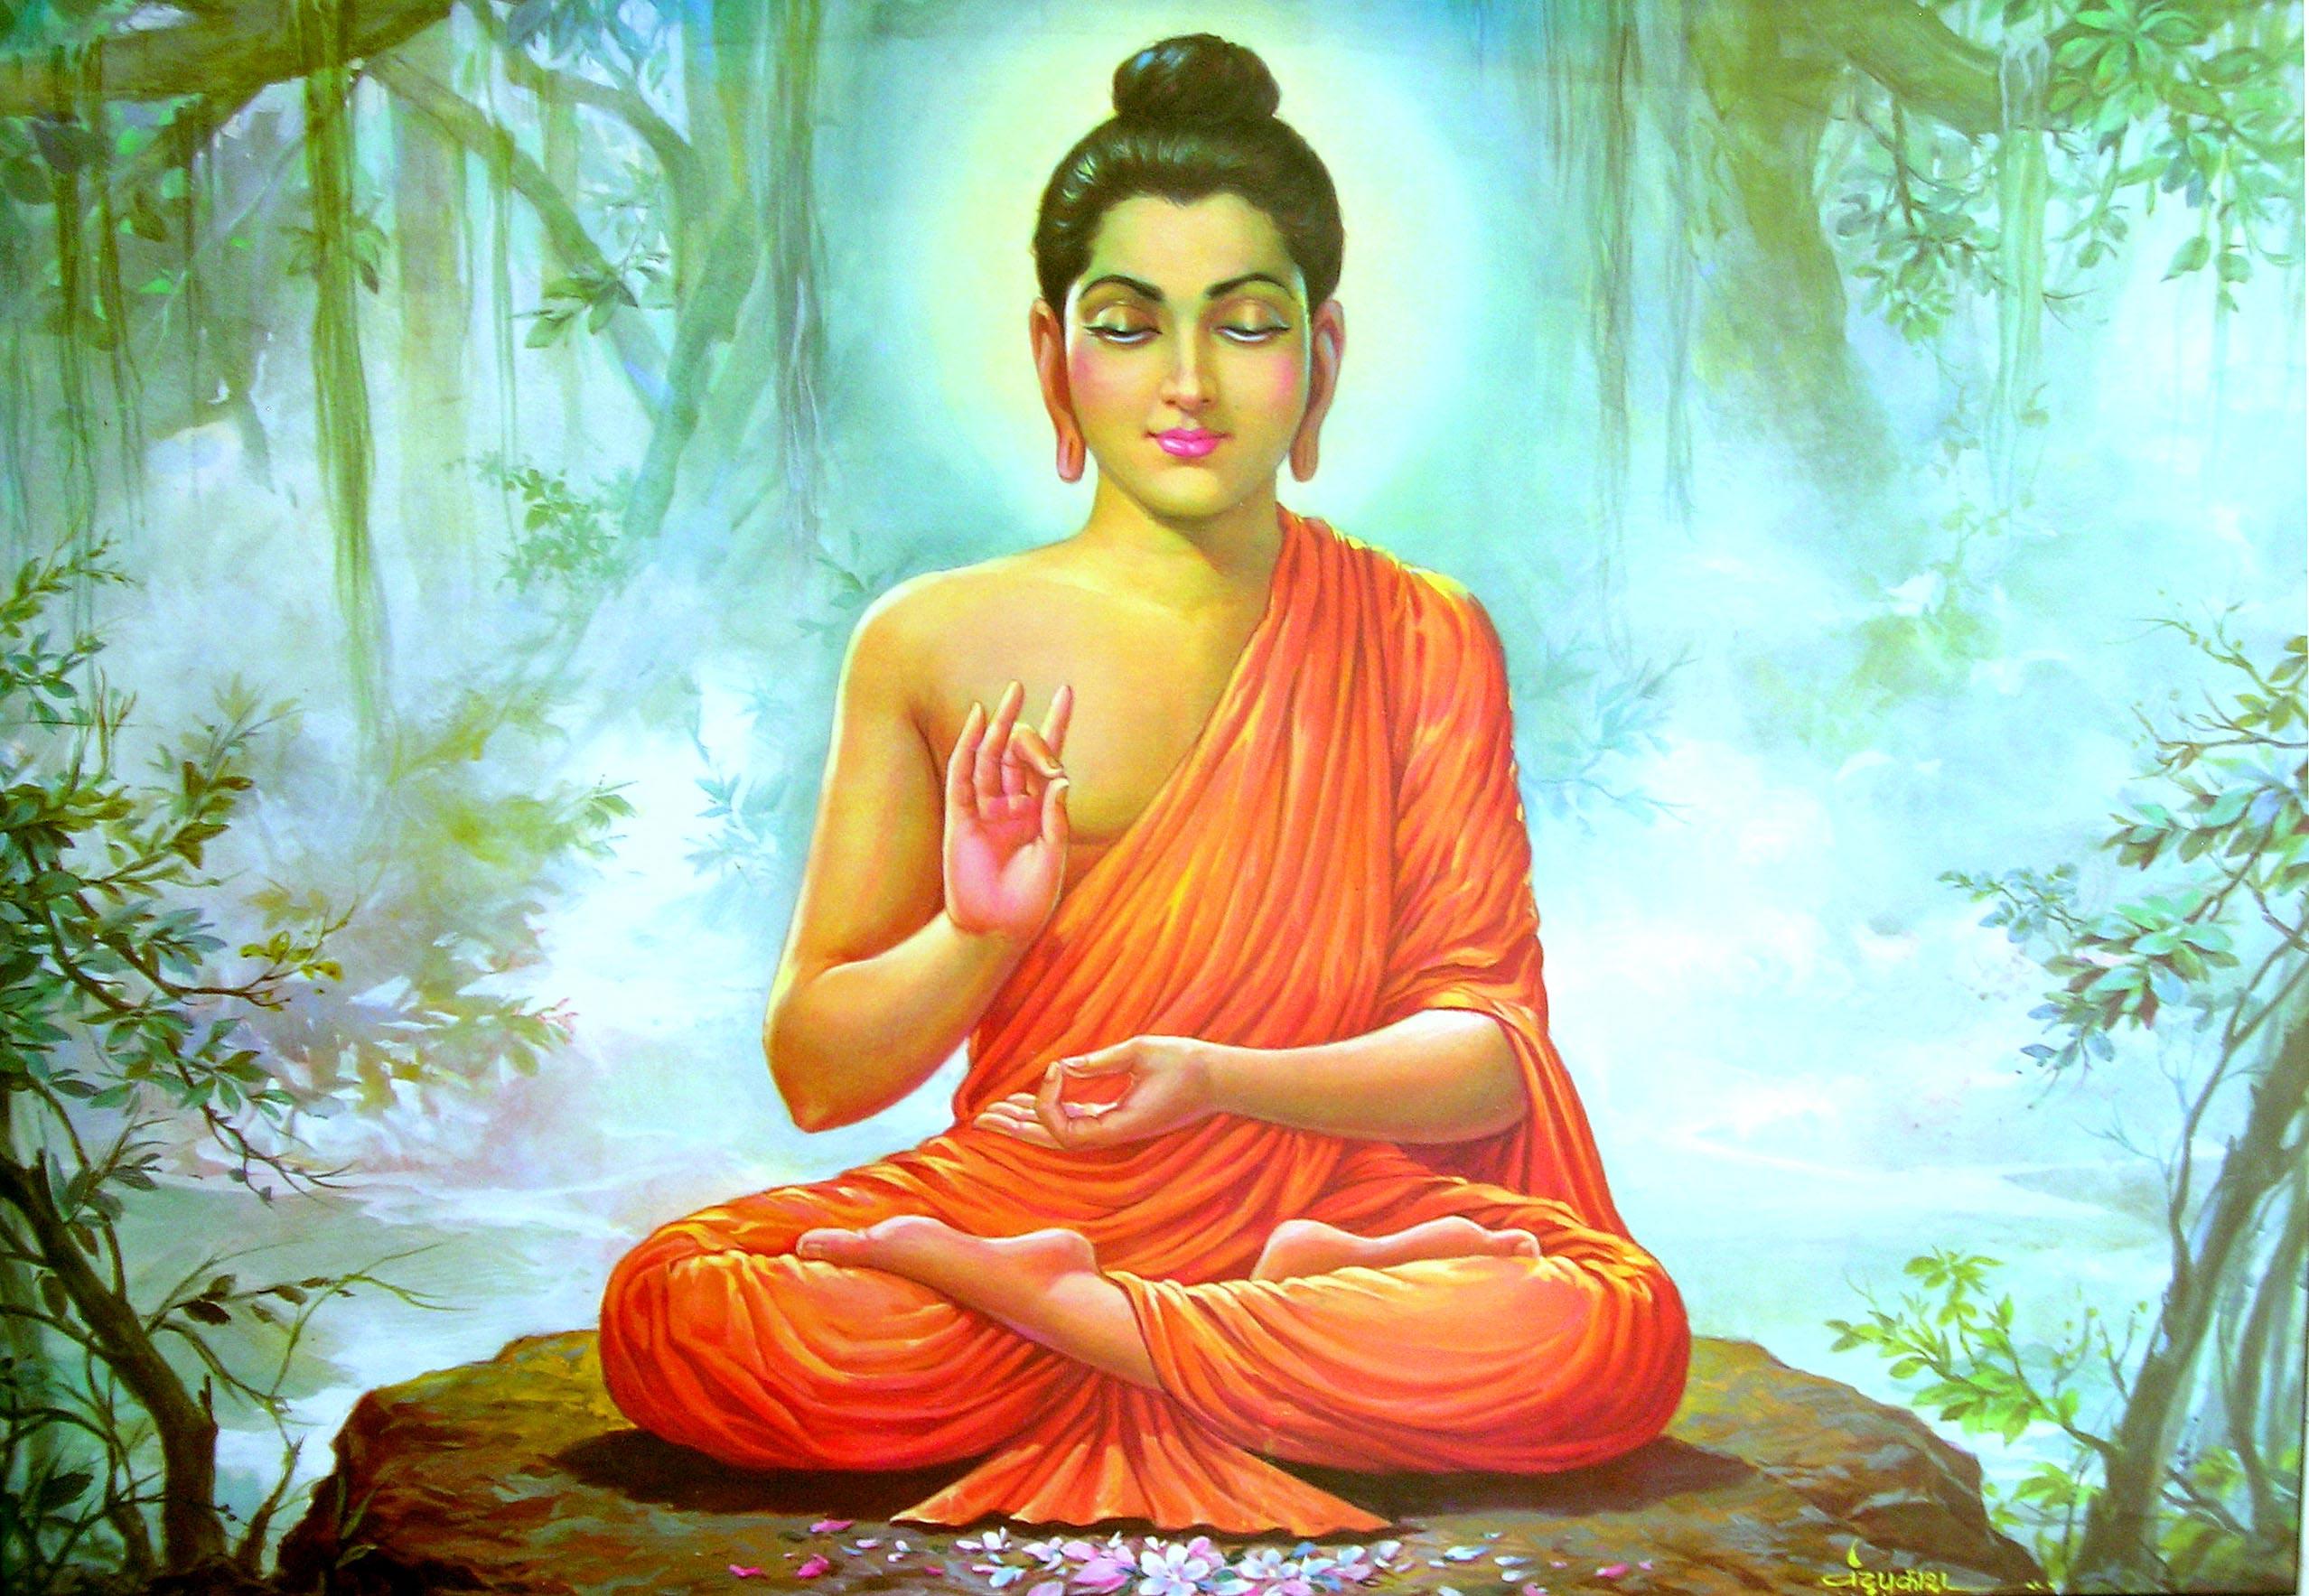 Buddha Wallpaper Images A17